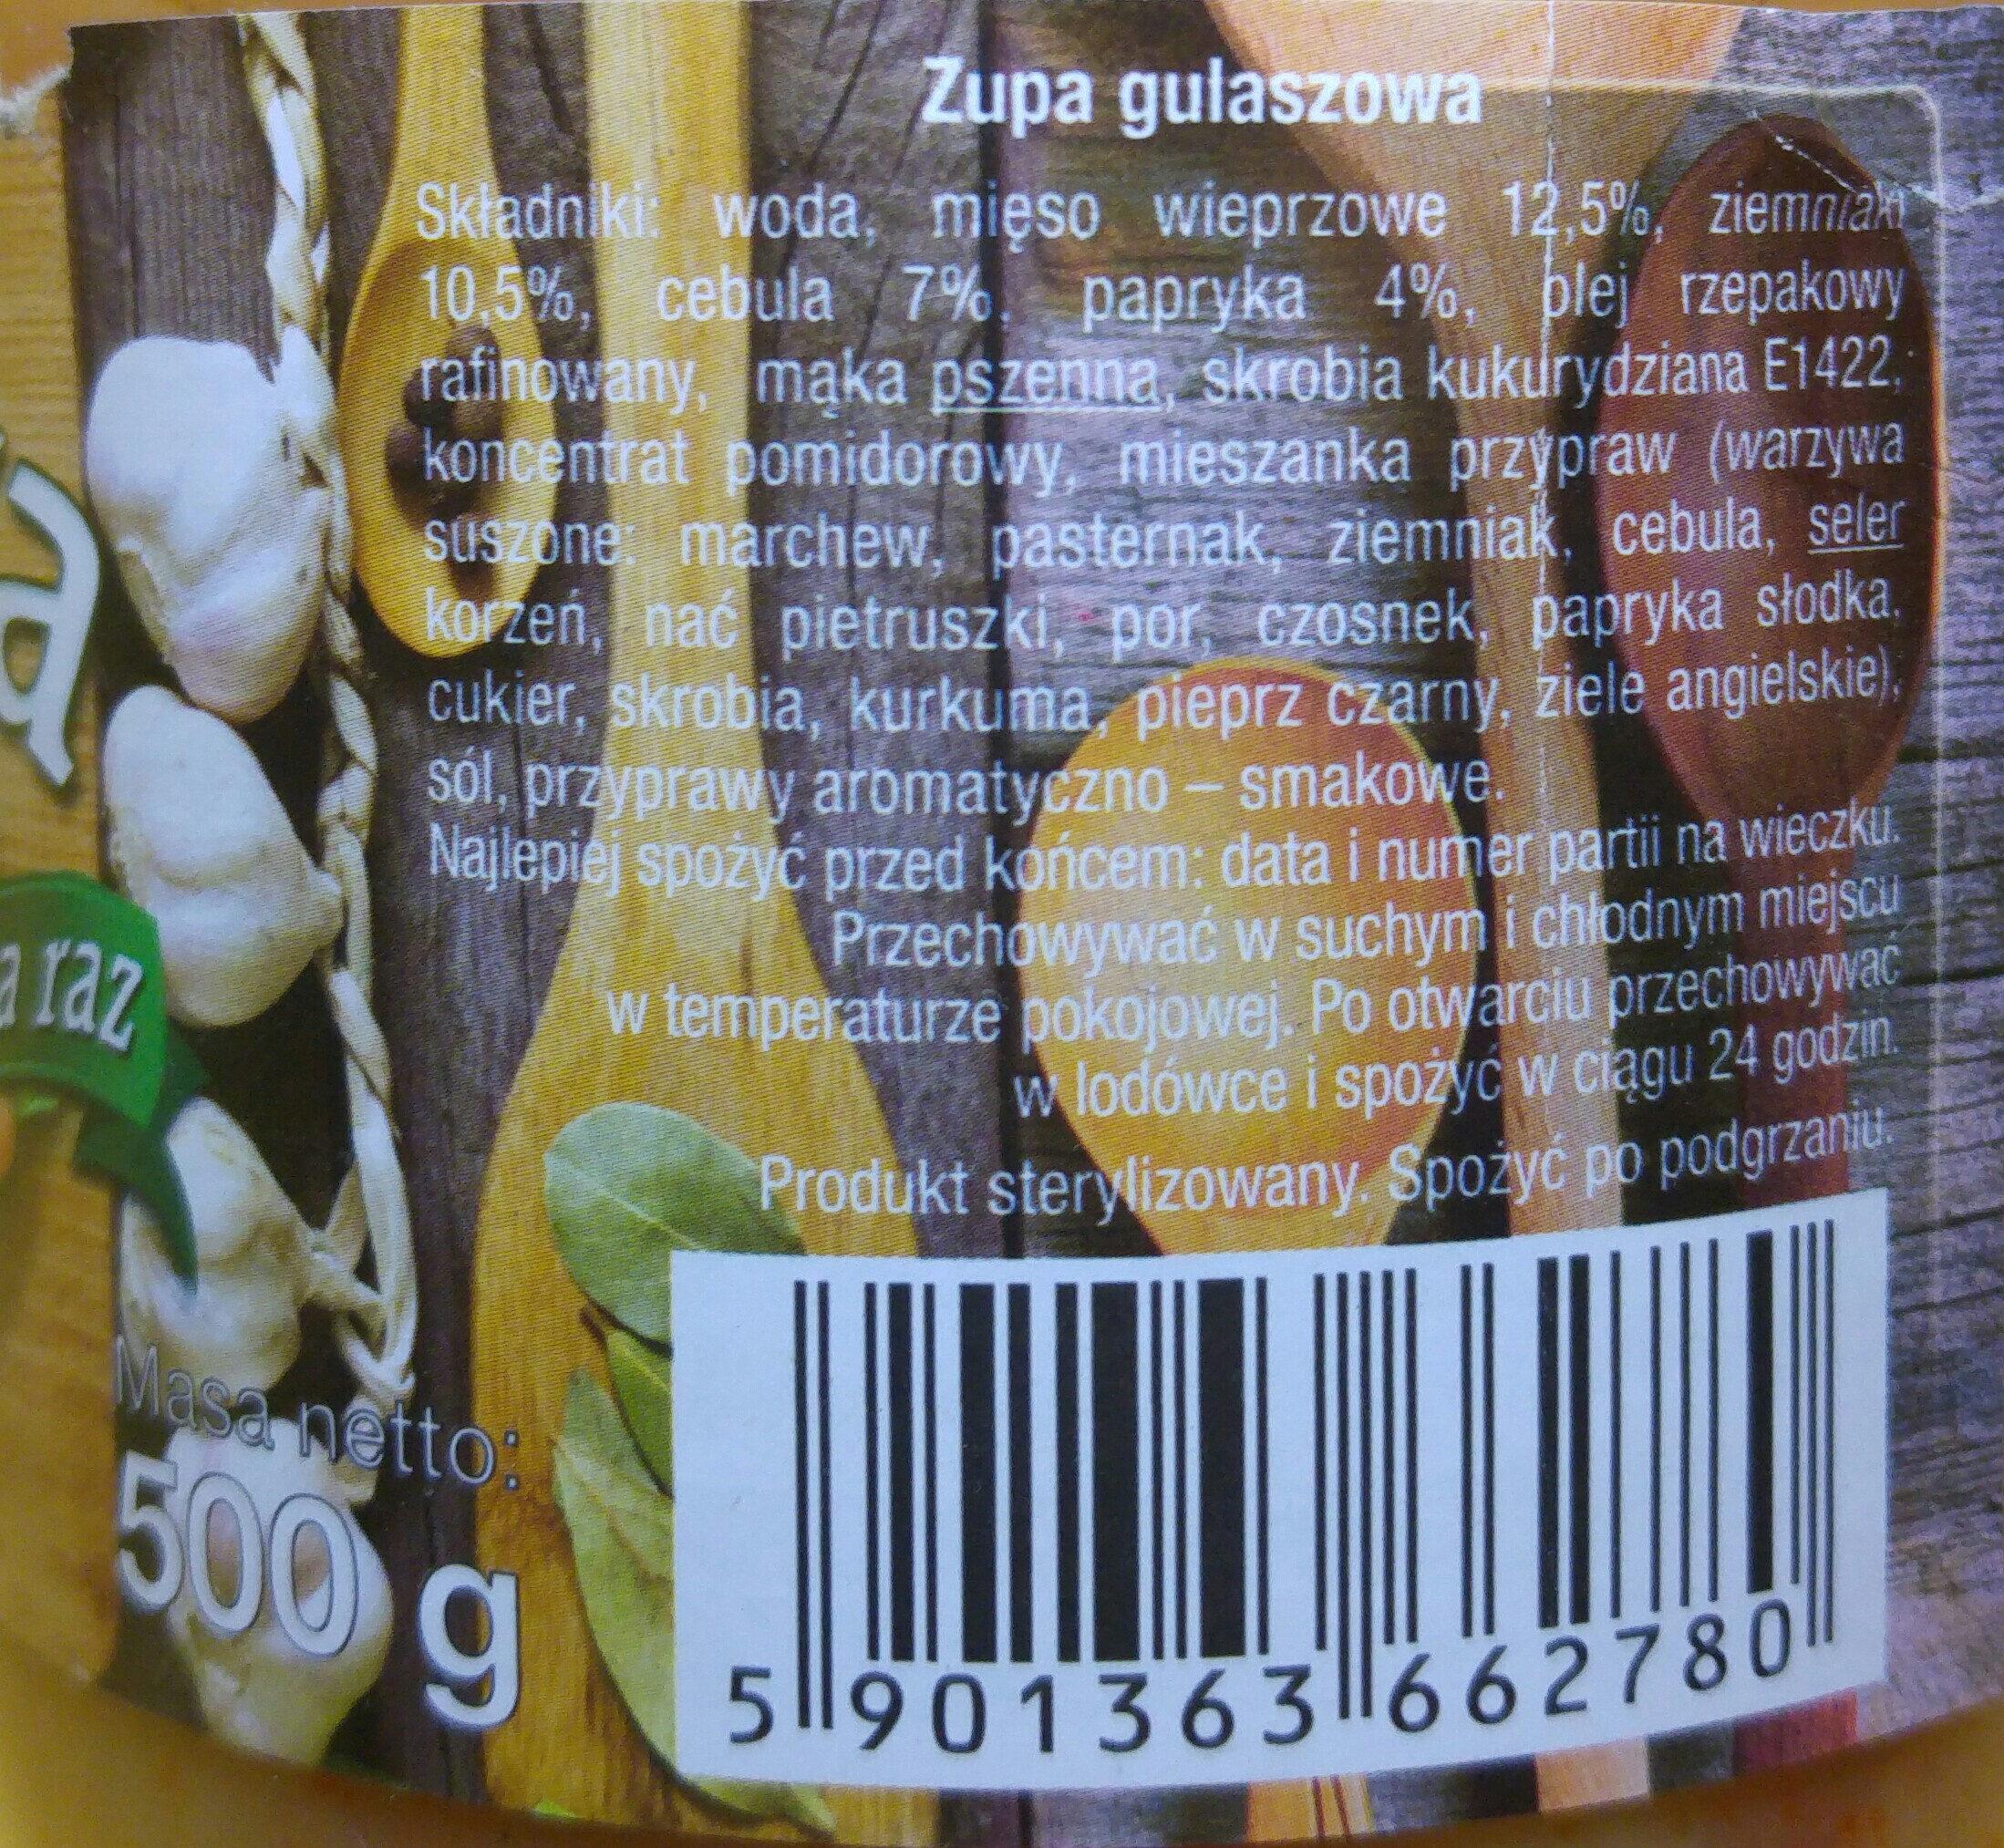 Zupa gulaszowa. - Ingredients - pl